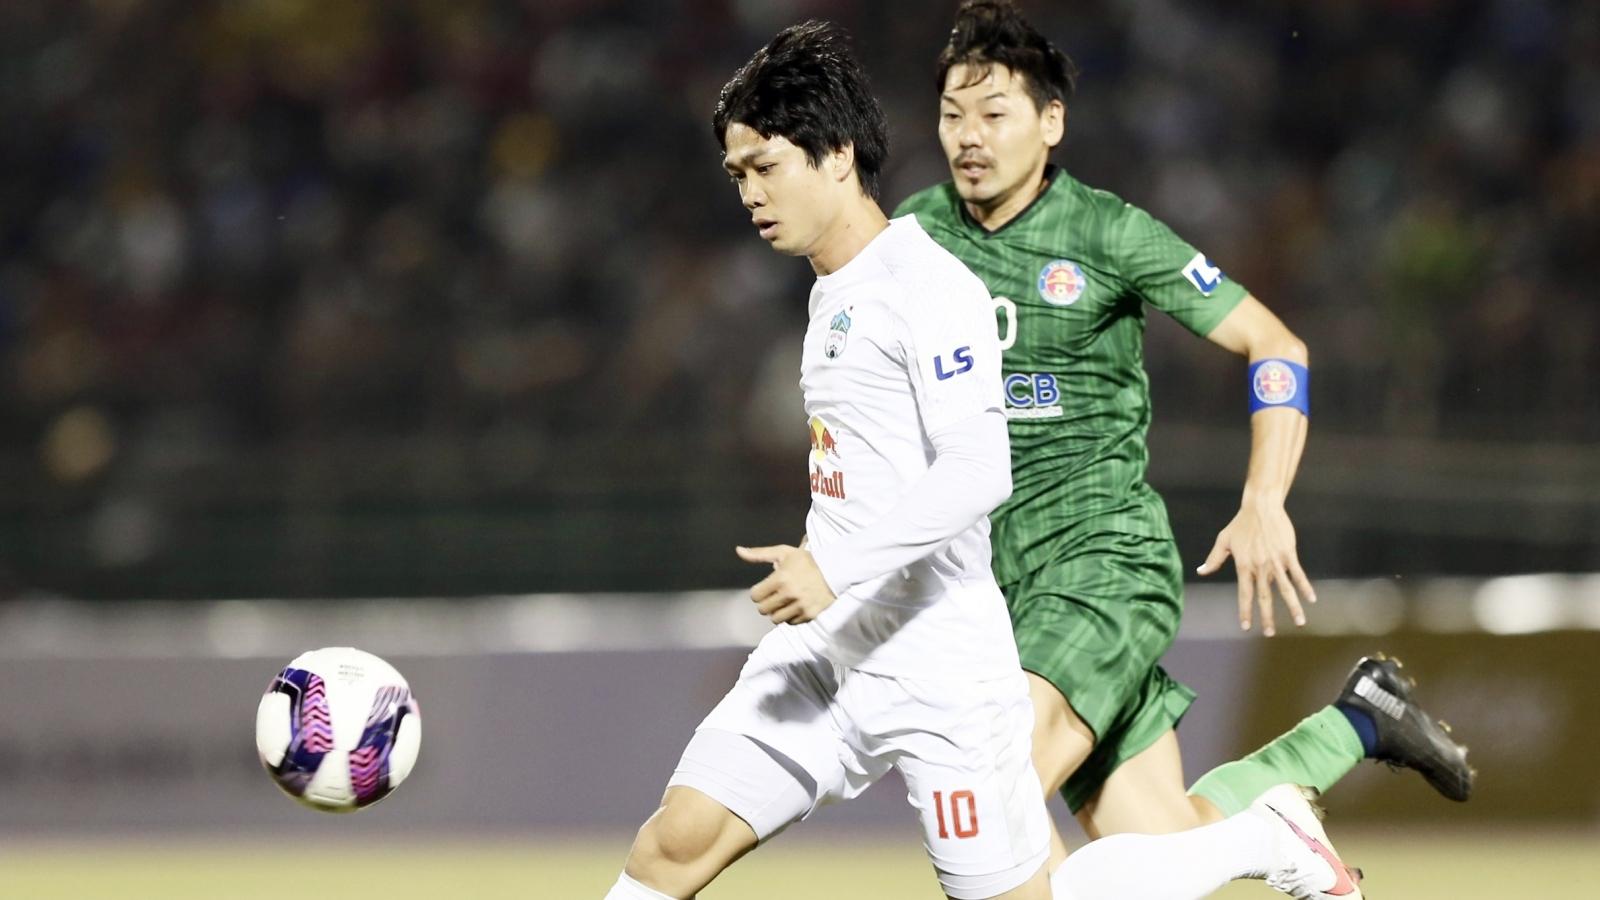 TRỰC TIẾP Sài Gòn FC 1-0 HAGL: Đỗ Merlo trừng phạt Hổ Bi-Rai